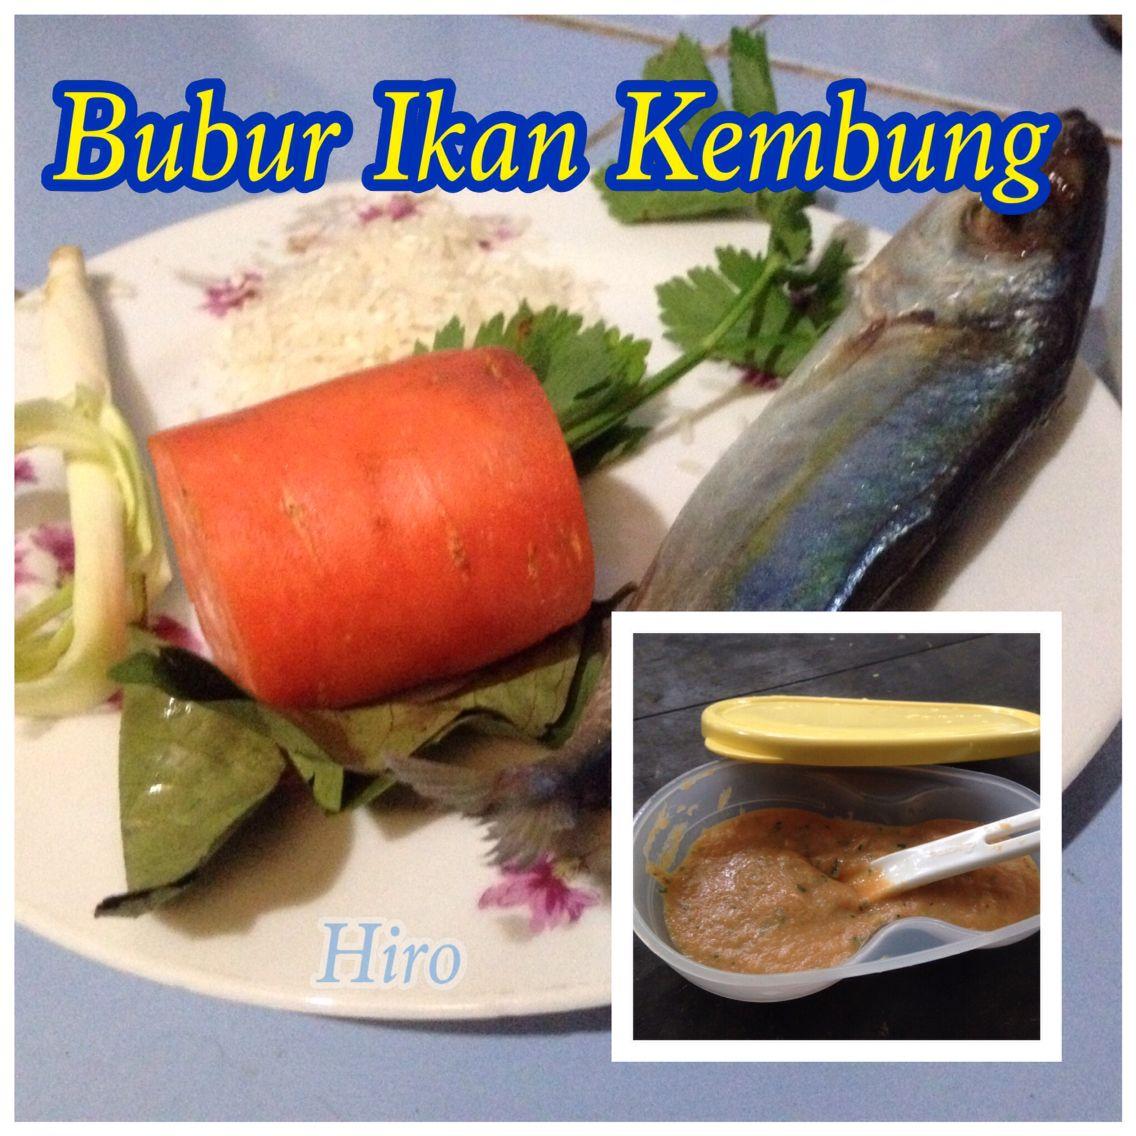 Mackerel Porridge For 7m Baby Bubur Ikan Kembung Untuk Bayi 7bulan Ke Atas Makanan Pendamping Makanan Bayi Makanan